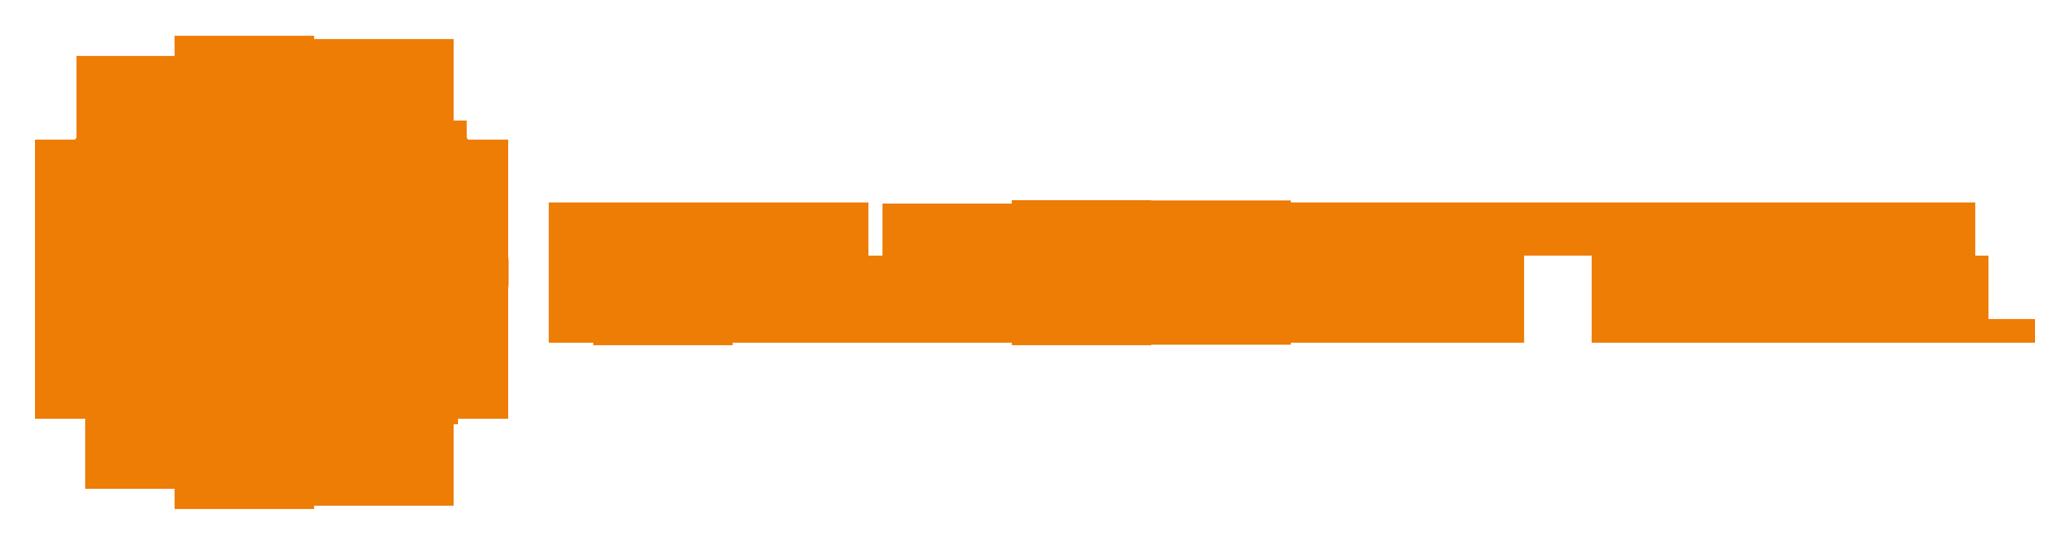 Durlacher Tafel